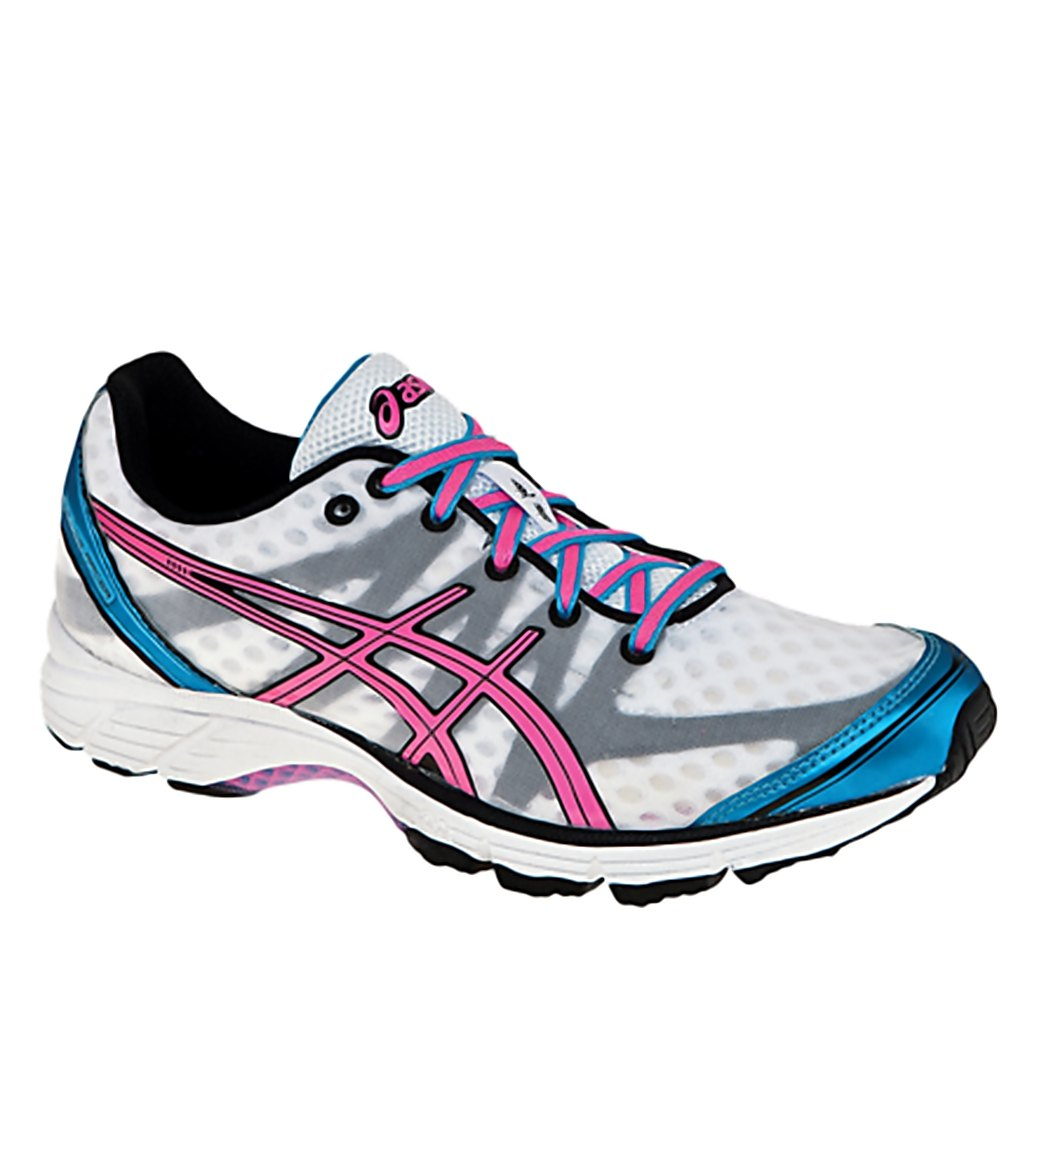 b72e3cef45c0 Asics Women s GEL-DS Racer 9 Running Shoe at SwimOutlet.com - Free Shipping